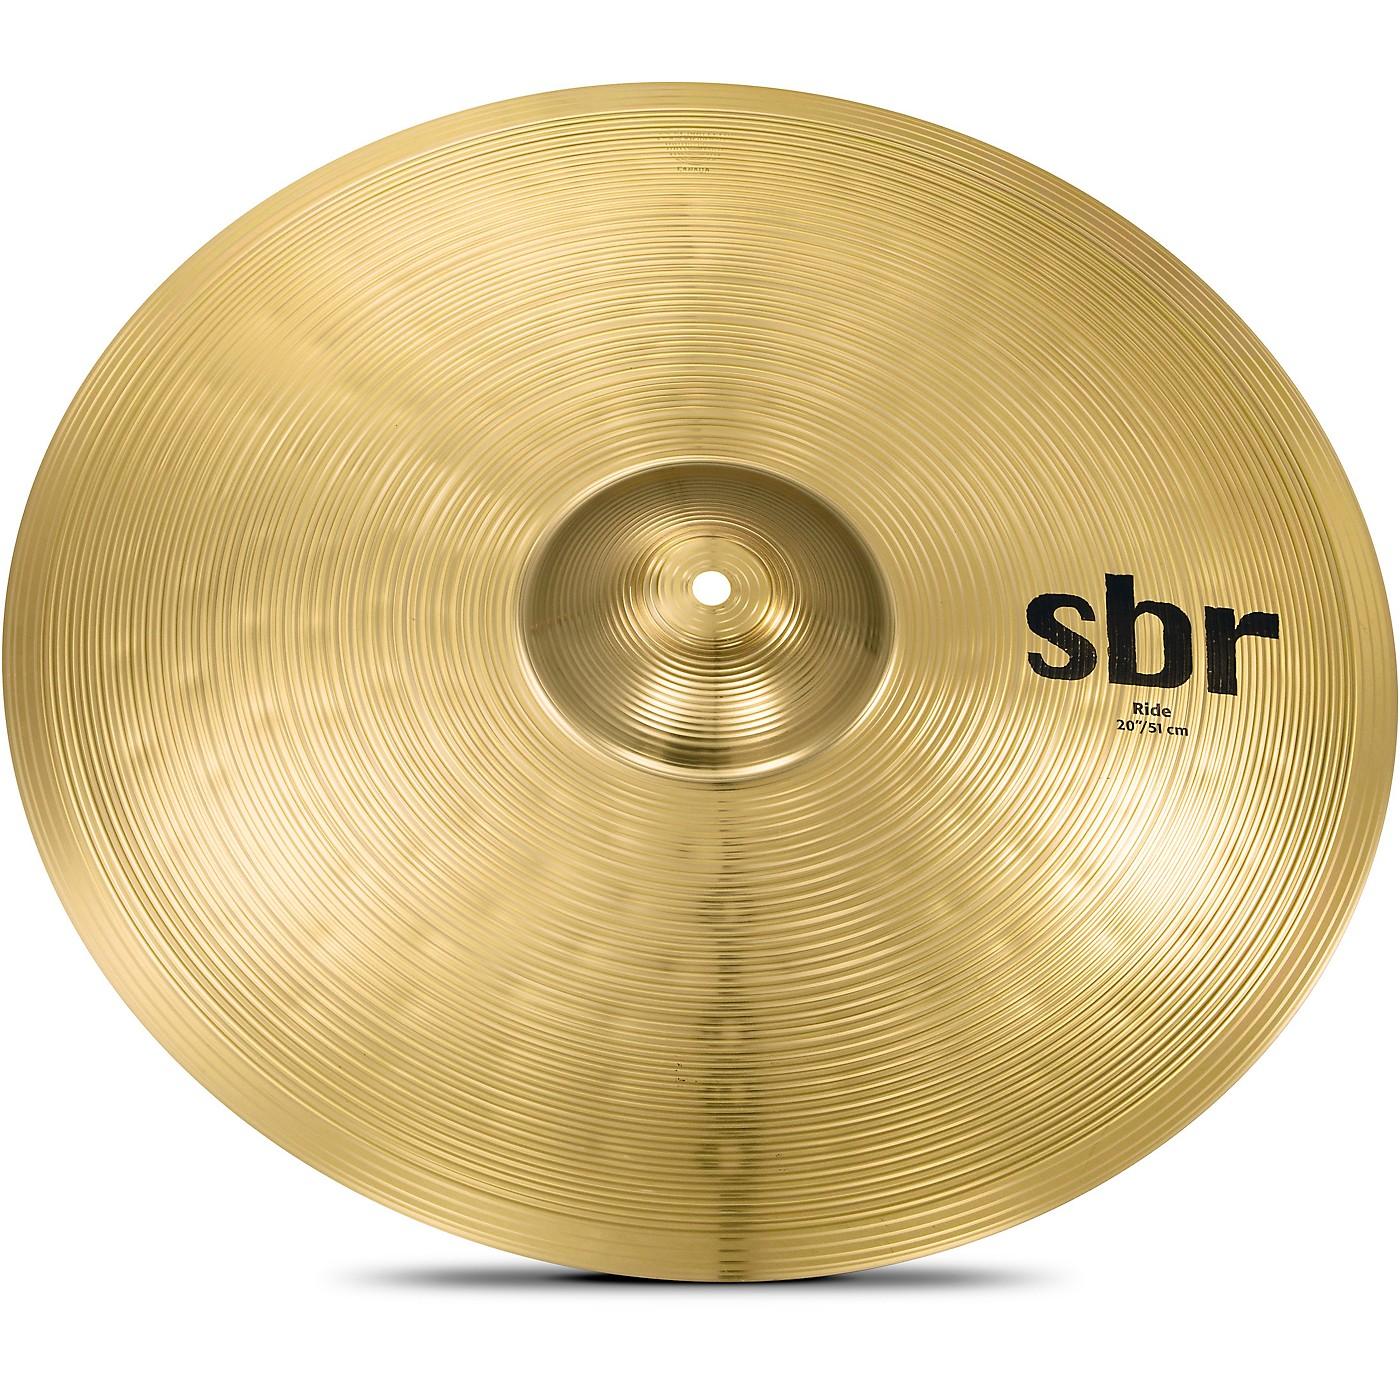 Sabian SBr Ride Cymbal thumbnail